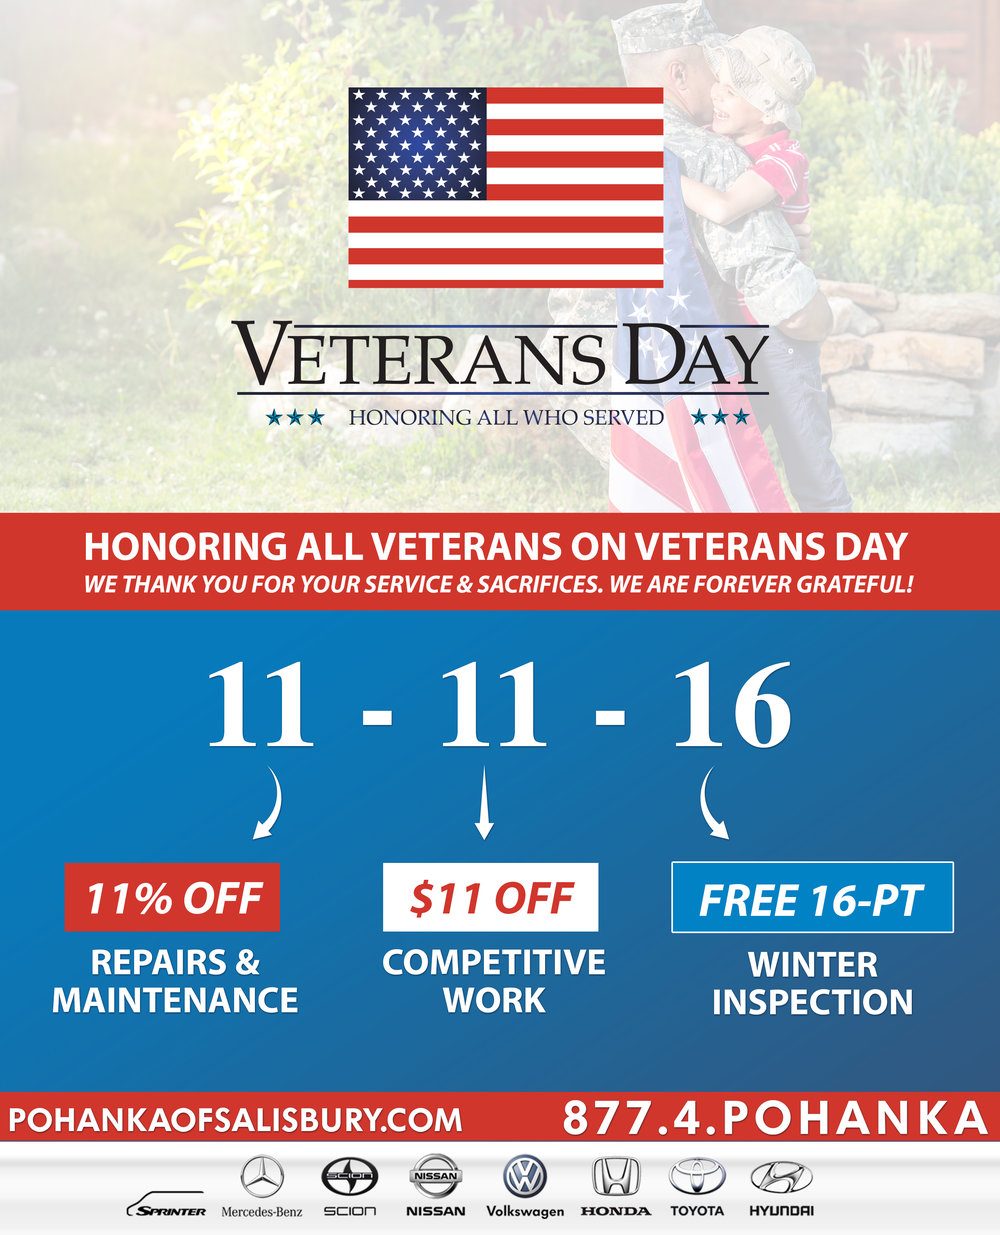 Veterans-Day-Landing-Page (1).jpg